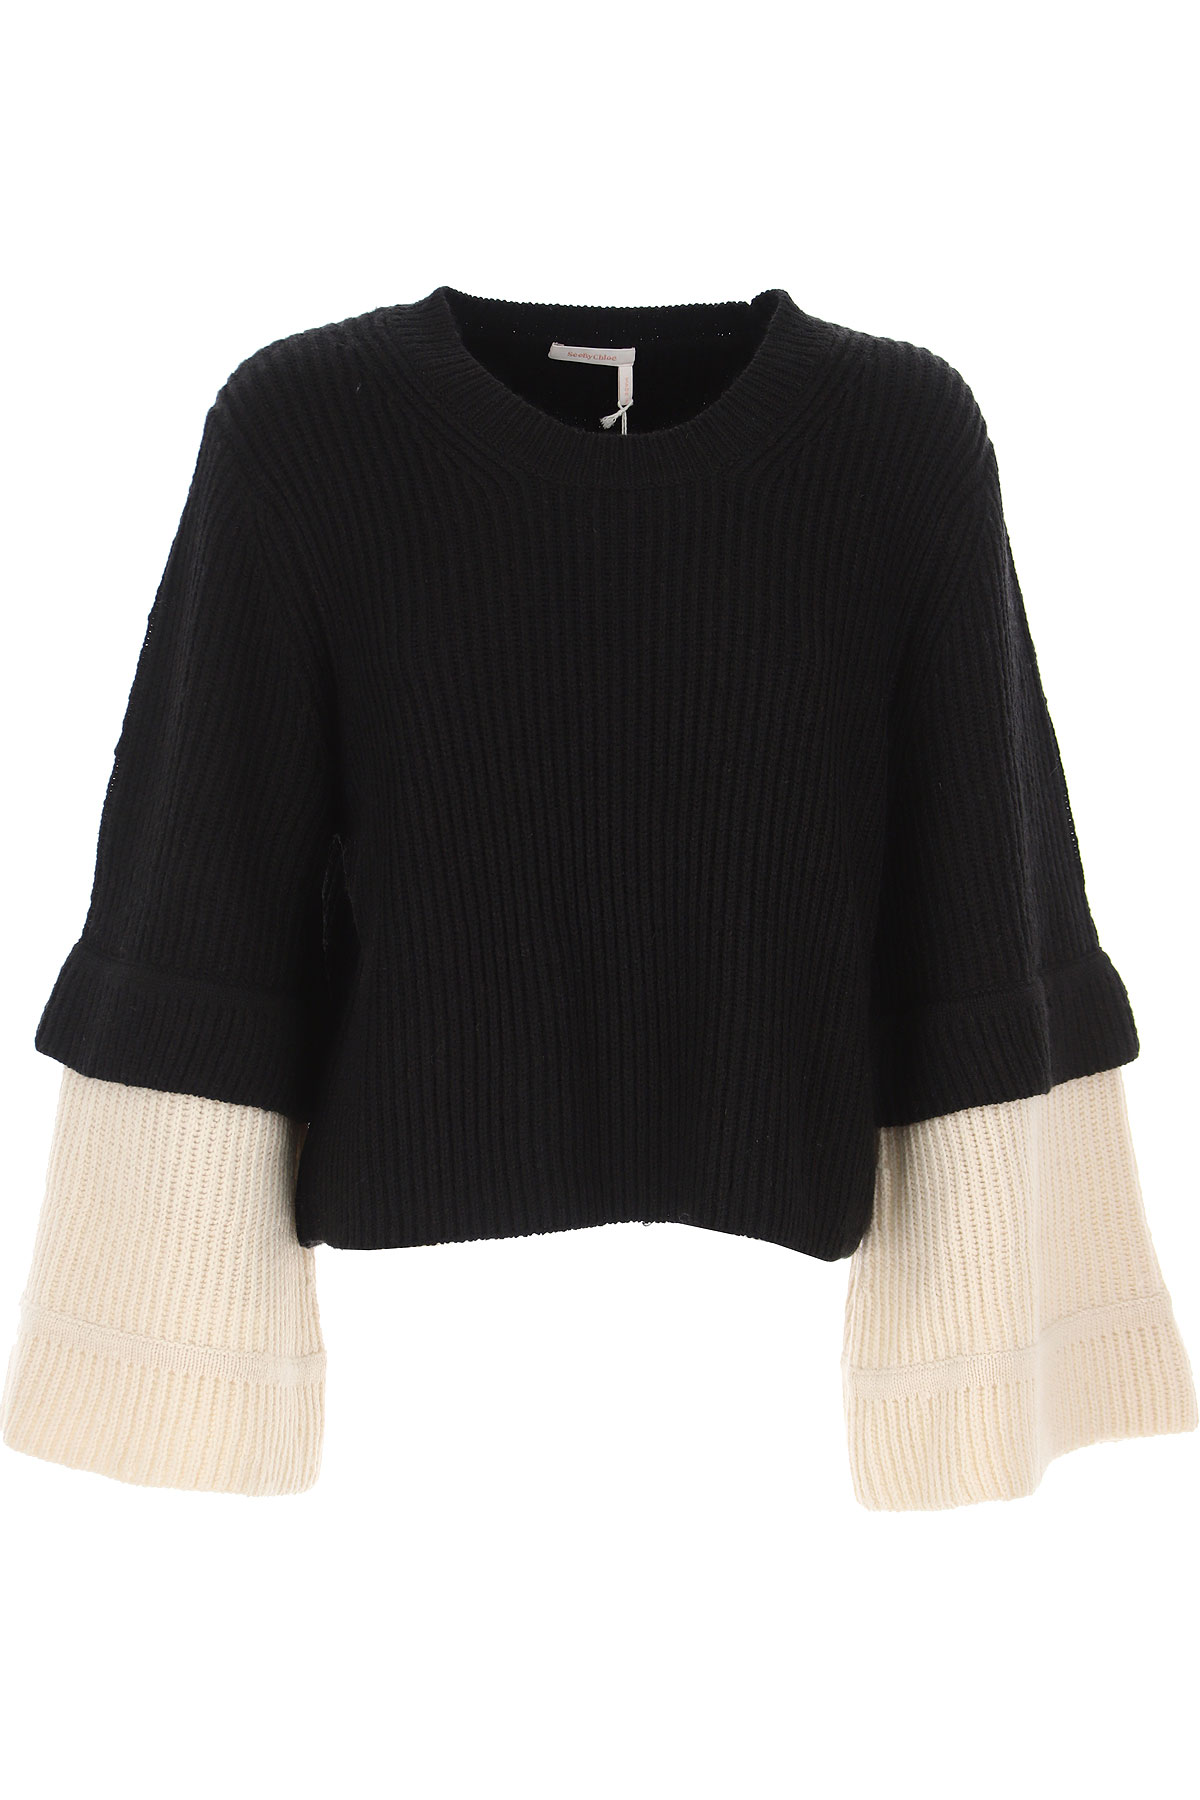 See By Chloe Sweater for Women Jumper, Black, Wool, 2019, 6 8